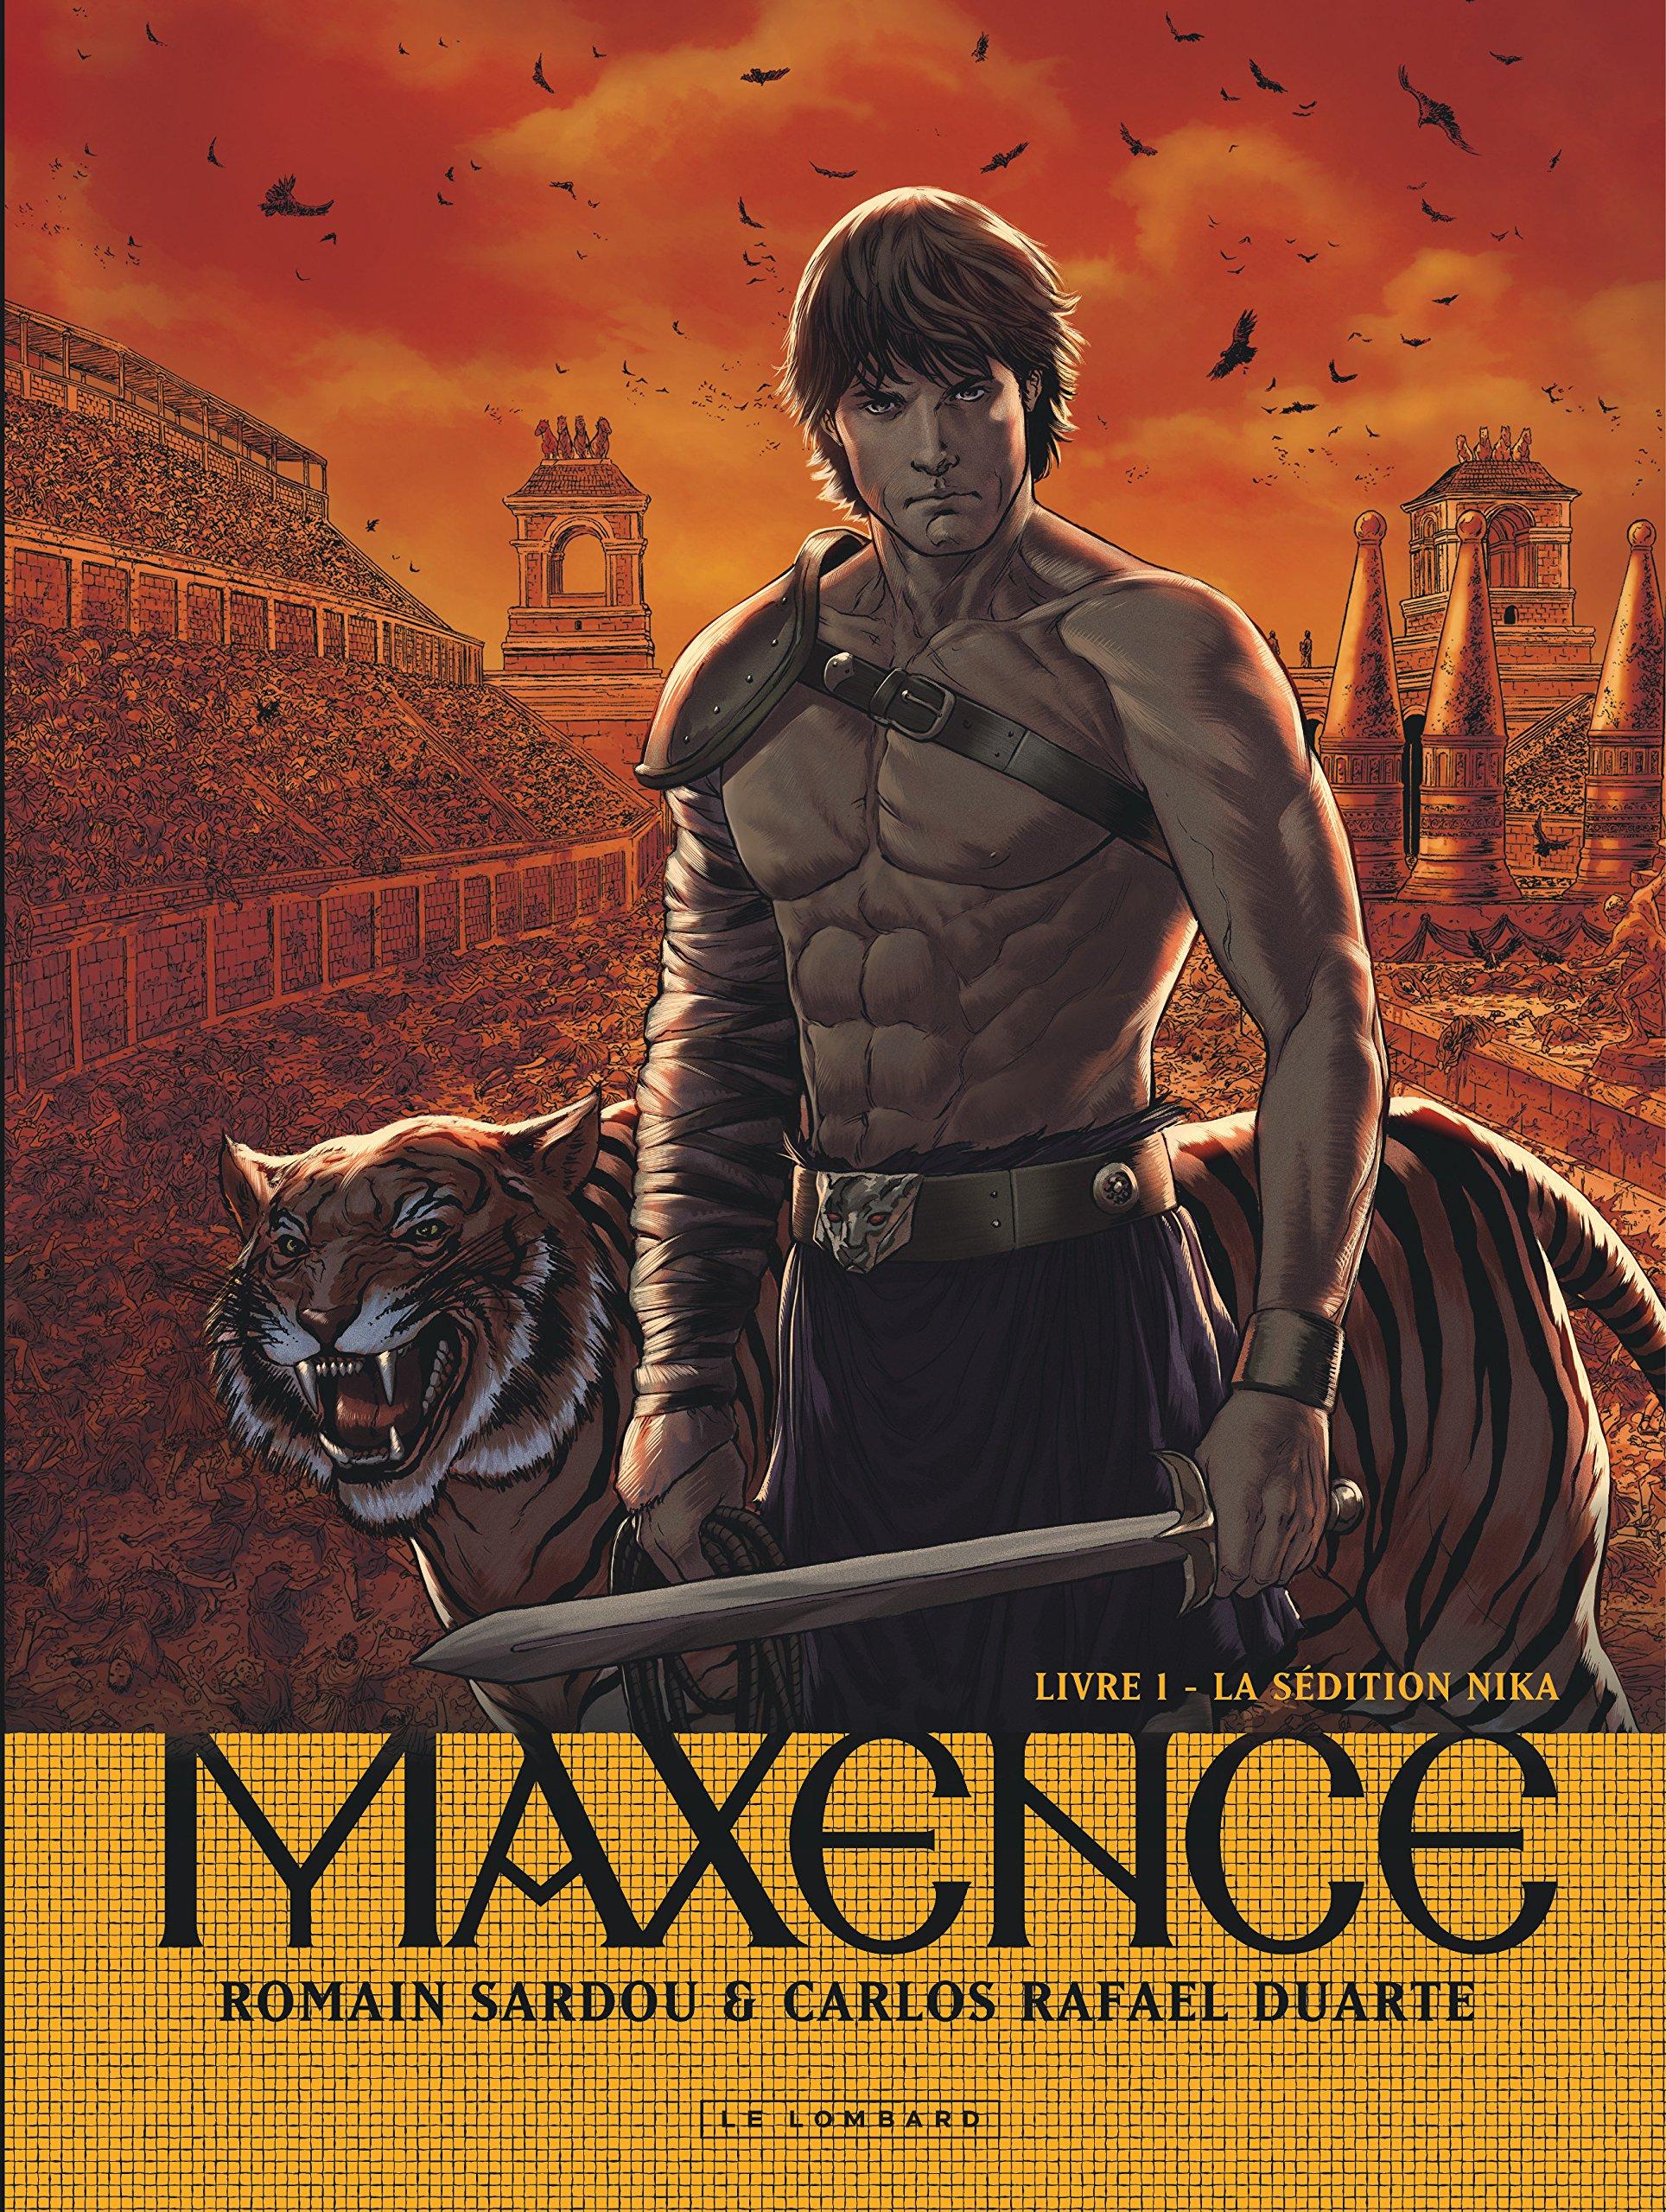 Asumir traicionar aburrido  Amazon.in: Buy Maxence - tome 1 - la sedition nika?? (reedition) Book  Online at Low Prices in India | Maxence - tome 1 - la sedition nika??  (reedition) Reviews & Ratings